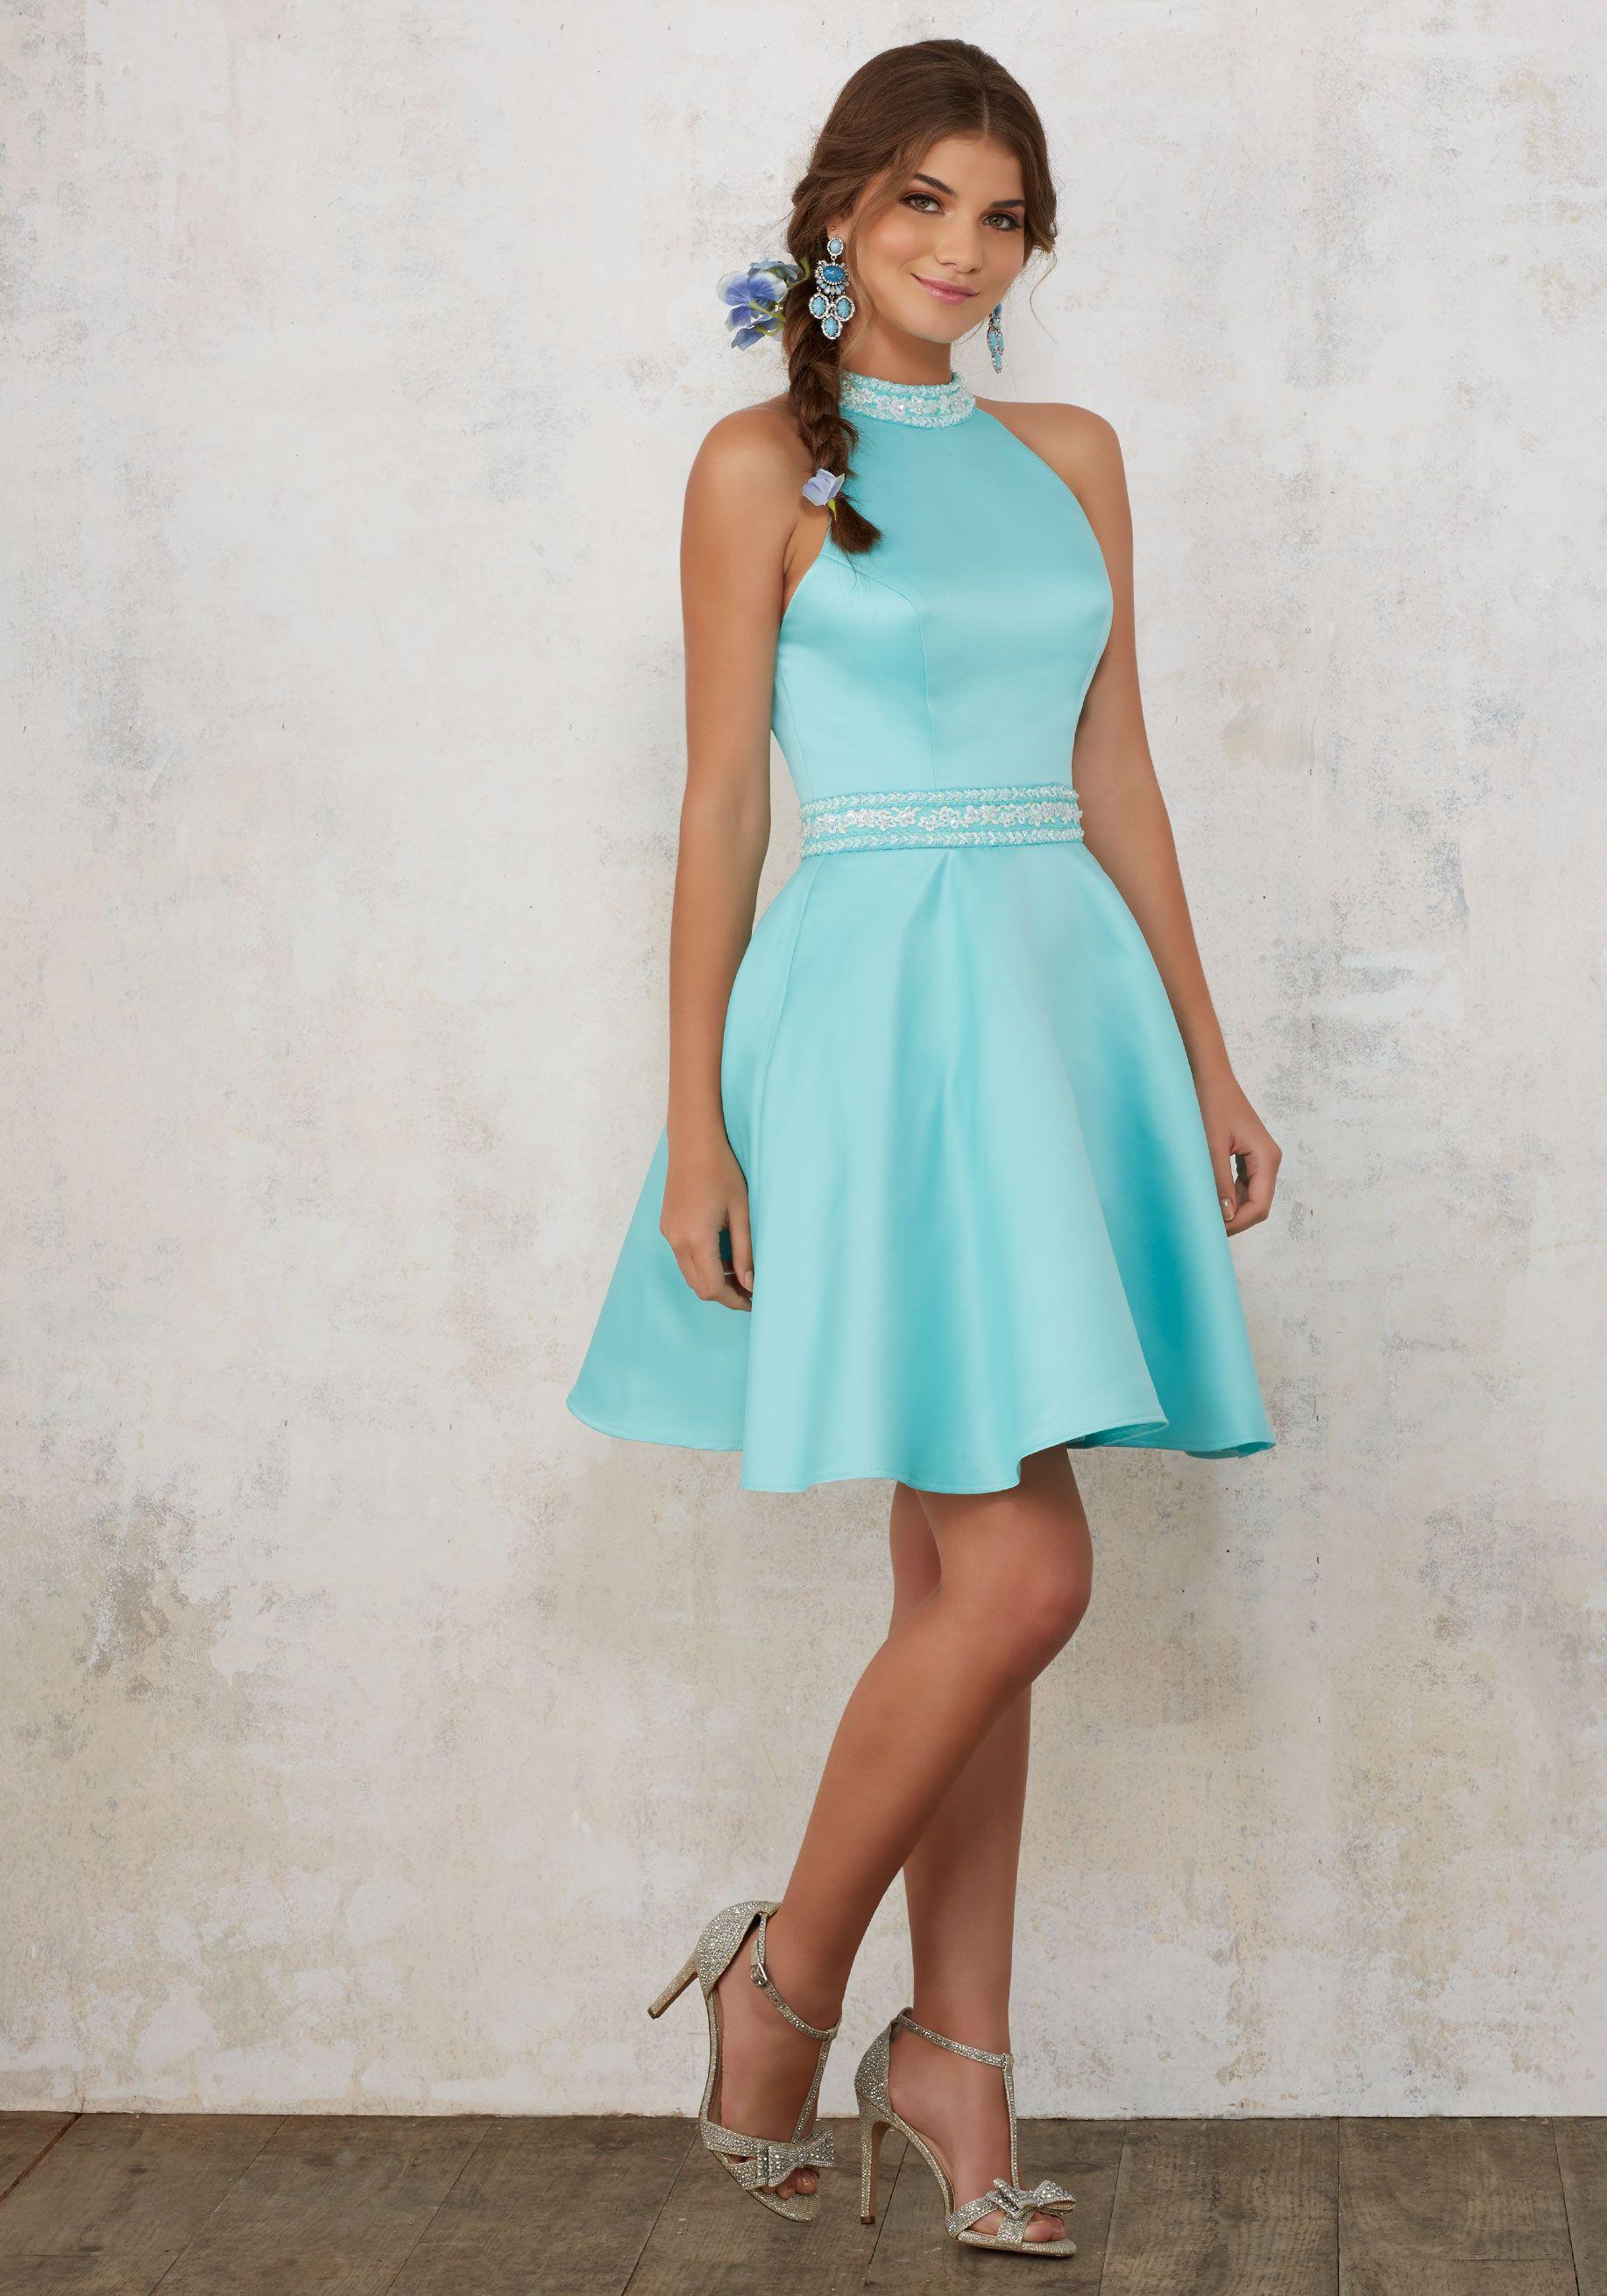 Dama blue dresses for quinceanera